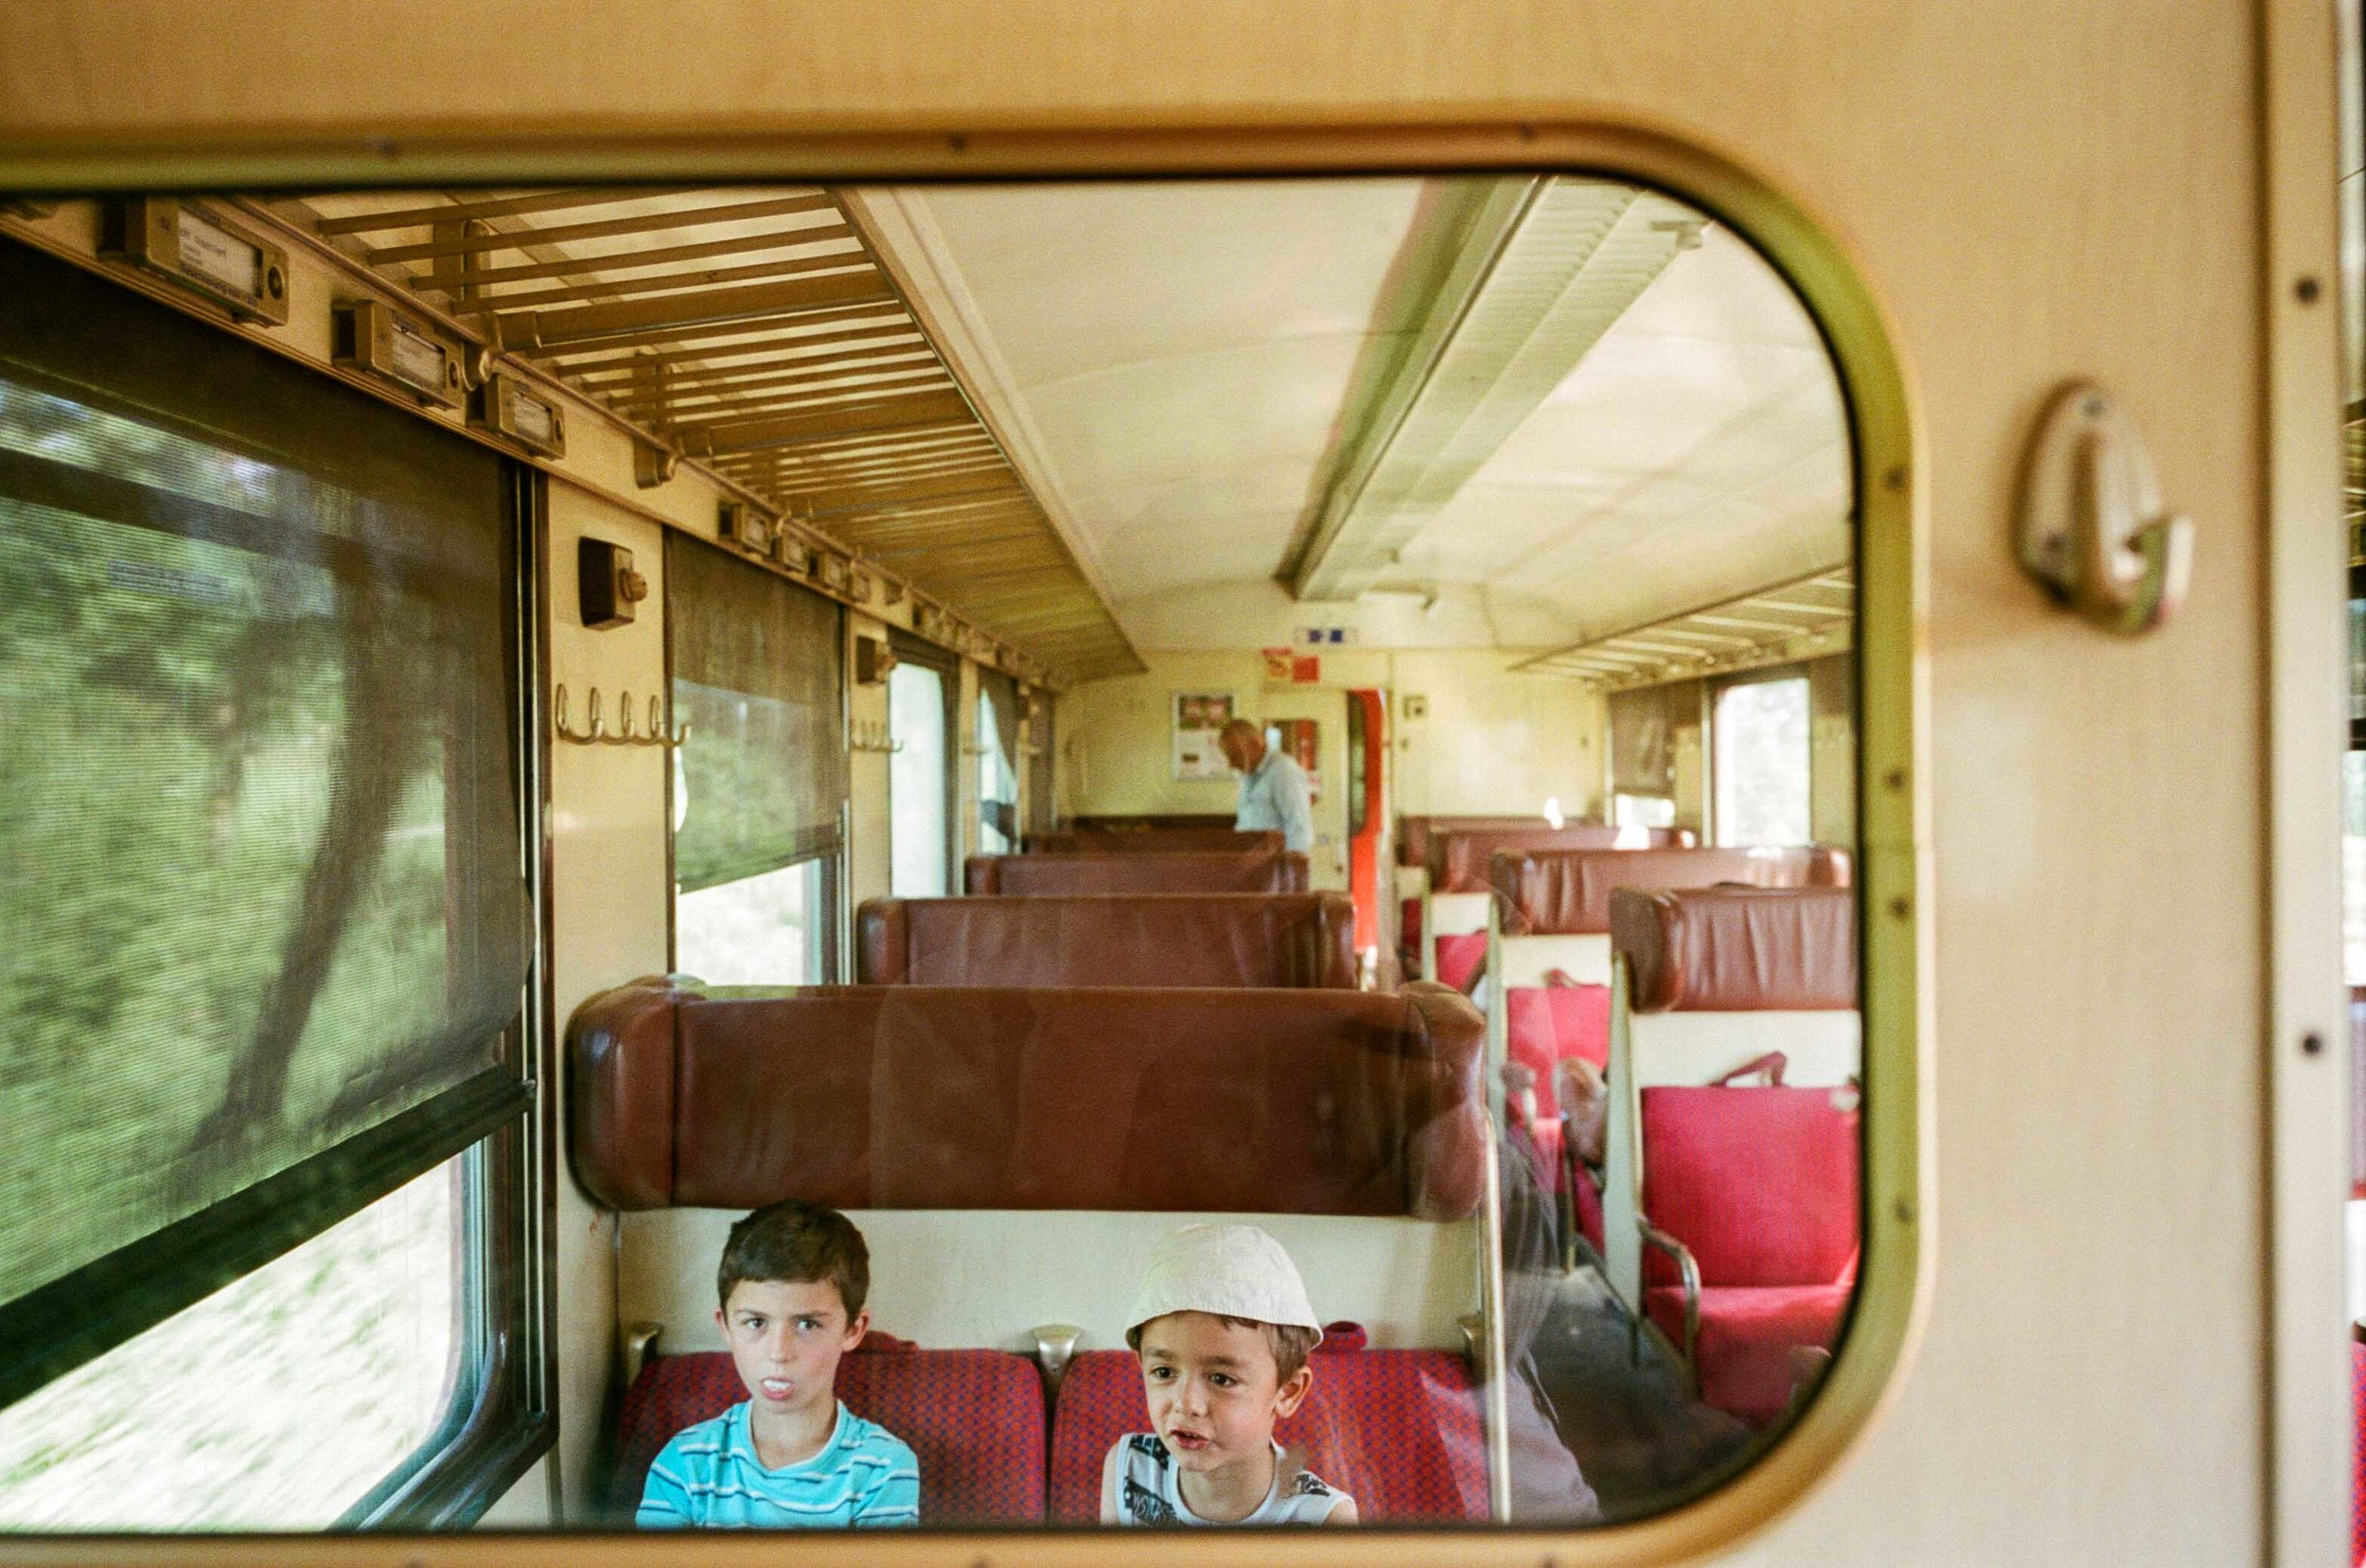 Pristina > Pejë via train, Kosovo